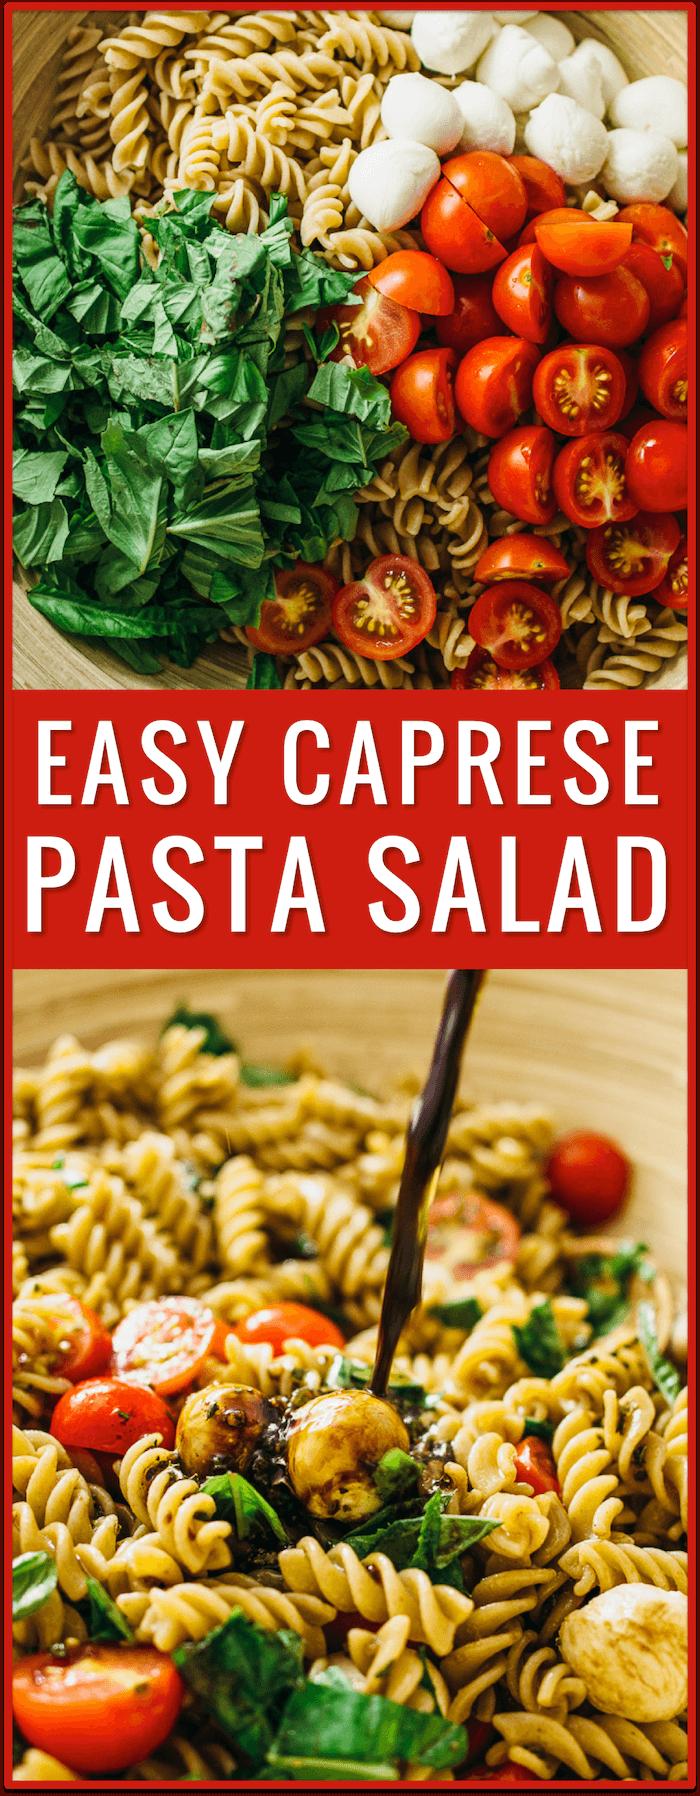 easy caprese pasta salad recipe, caprese salad, caprese appetizer, cherry tomatoes, grape tomatoes, chopped caprese salad, ingredients, tomato, mozzarella cheese, fresh basil, lunch, dinner, side dish, idea